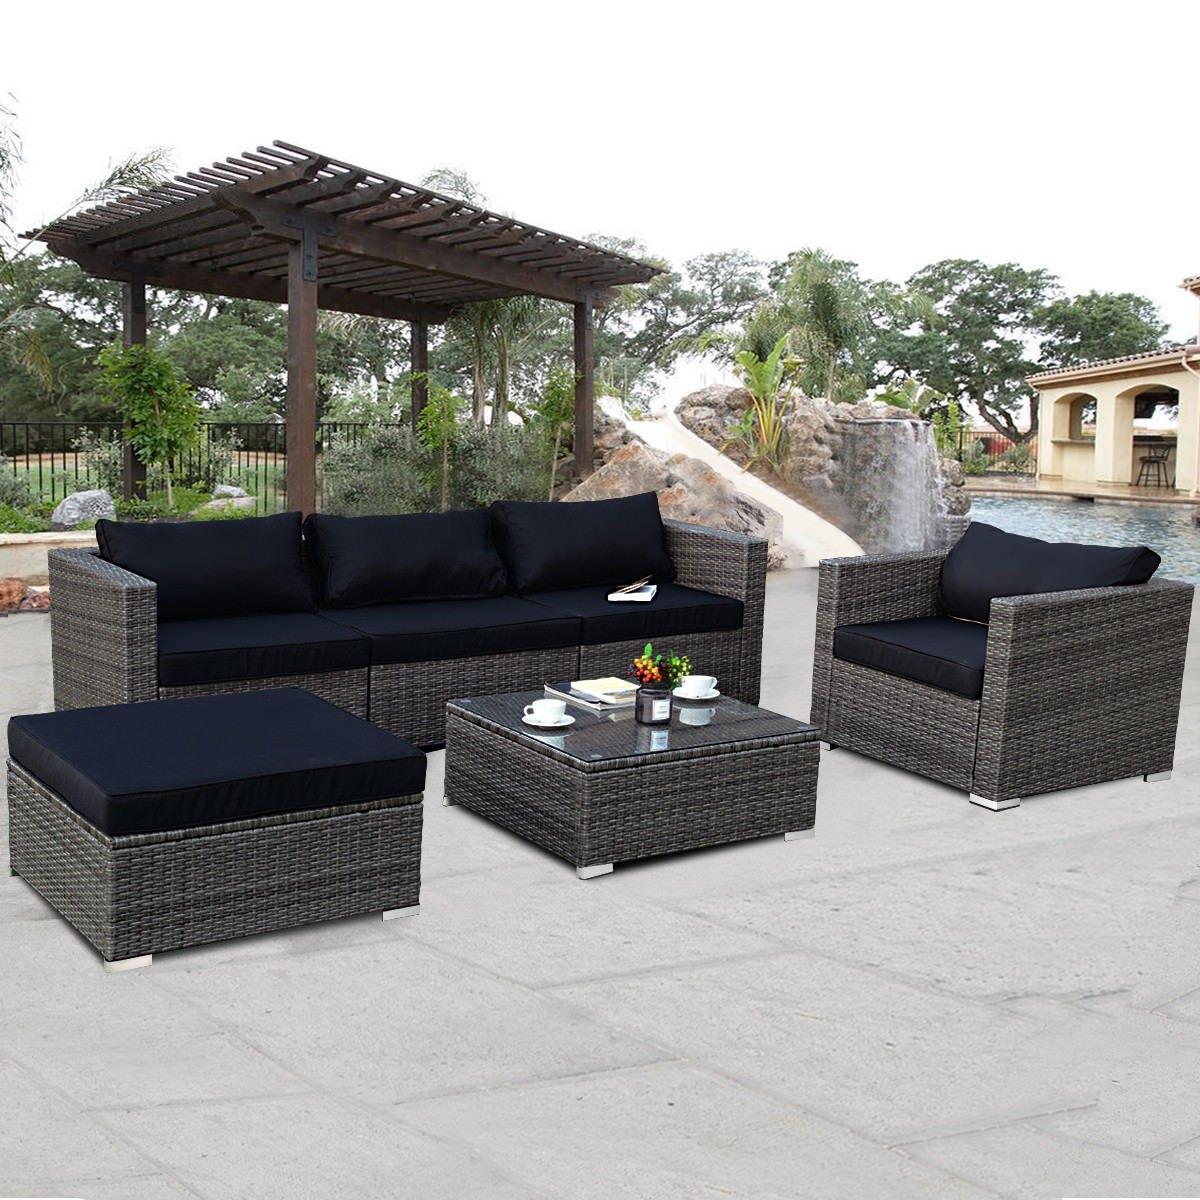 costway 6-piece rattan wicker patio furniture set sectional